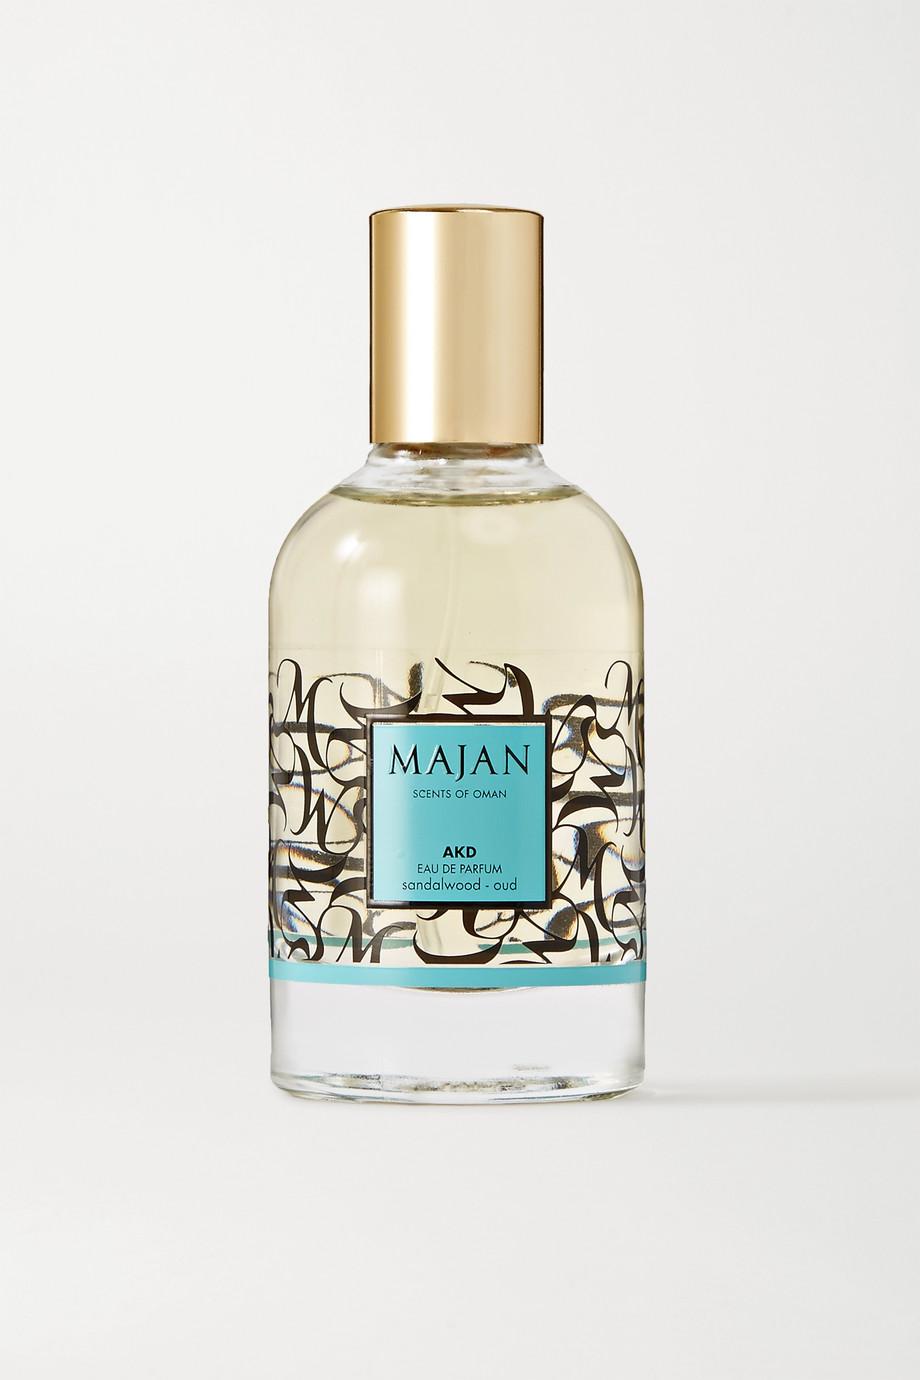 MAJAN AKD, 50 ml – Eau de Parfum